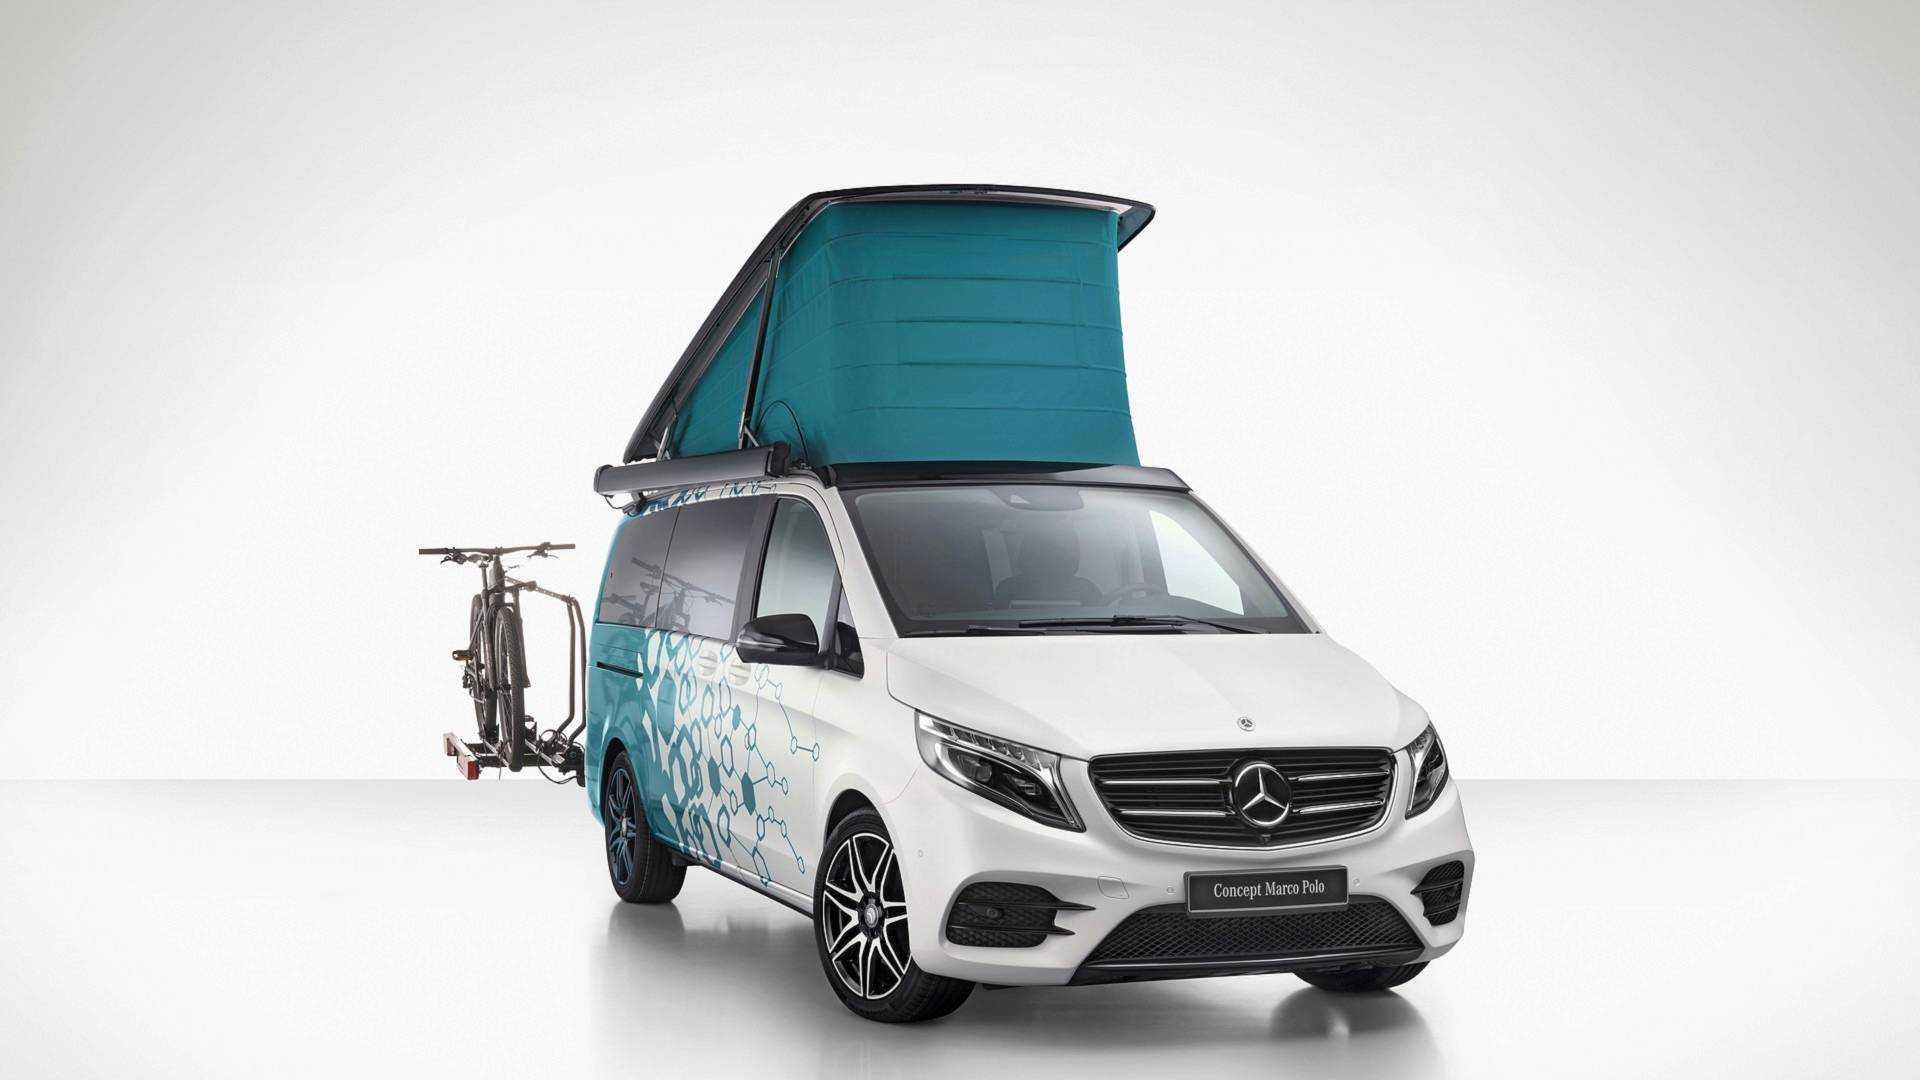 mercedes shows off tech-heavy camper vans, fuel cell sprinter